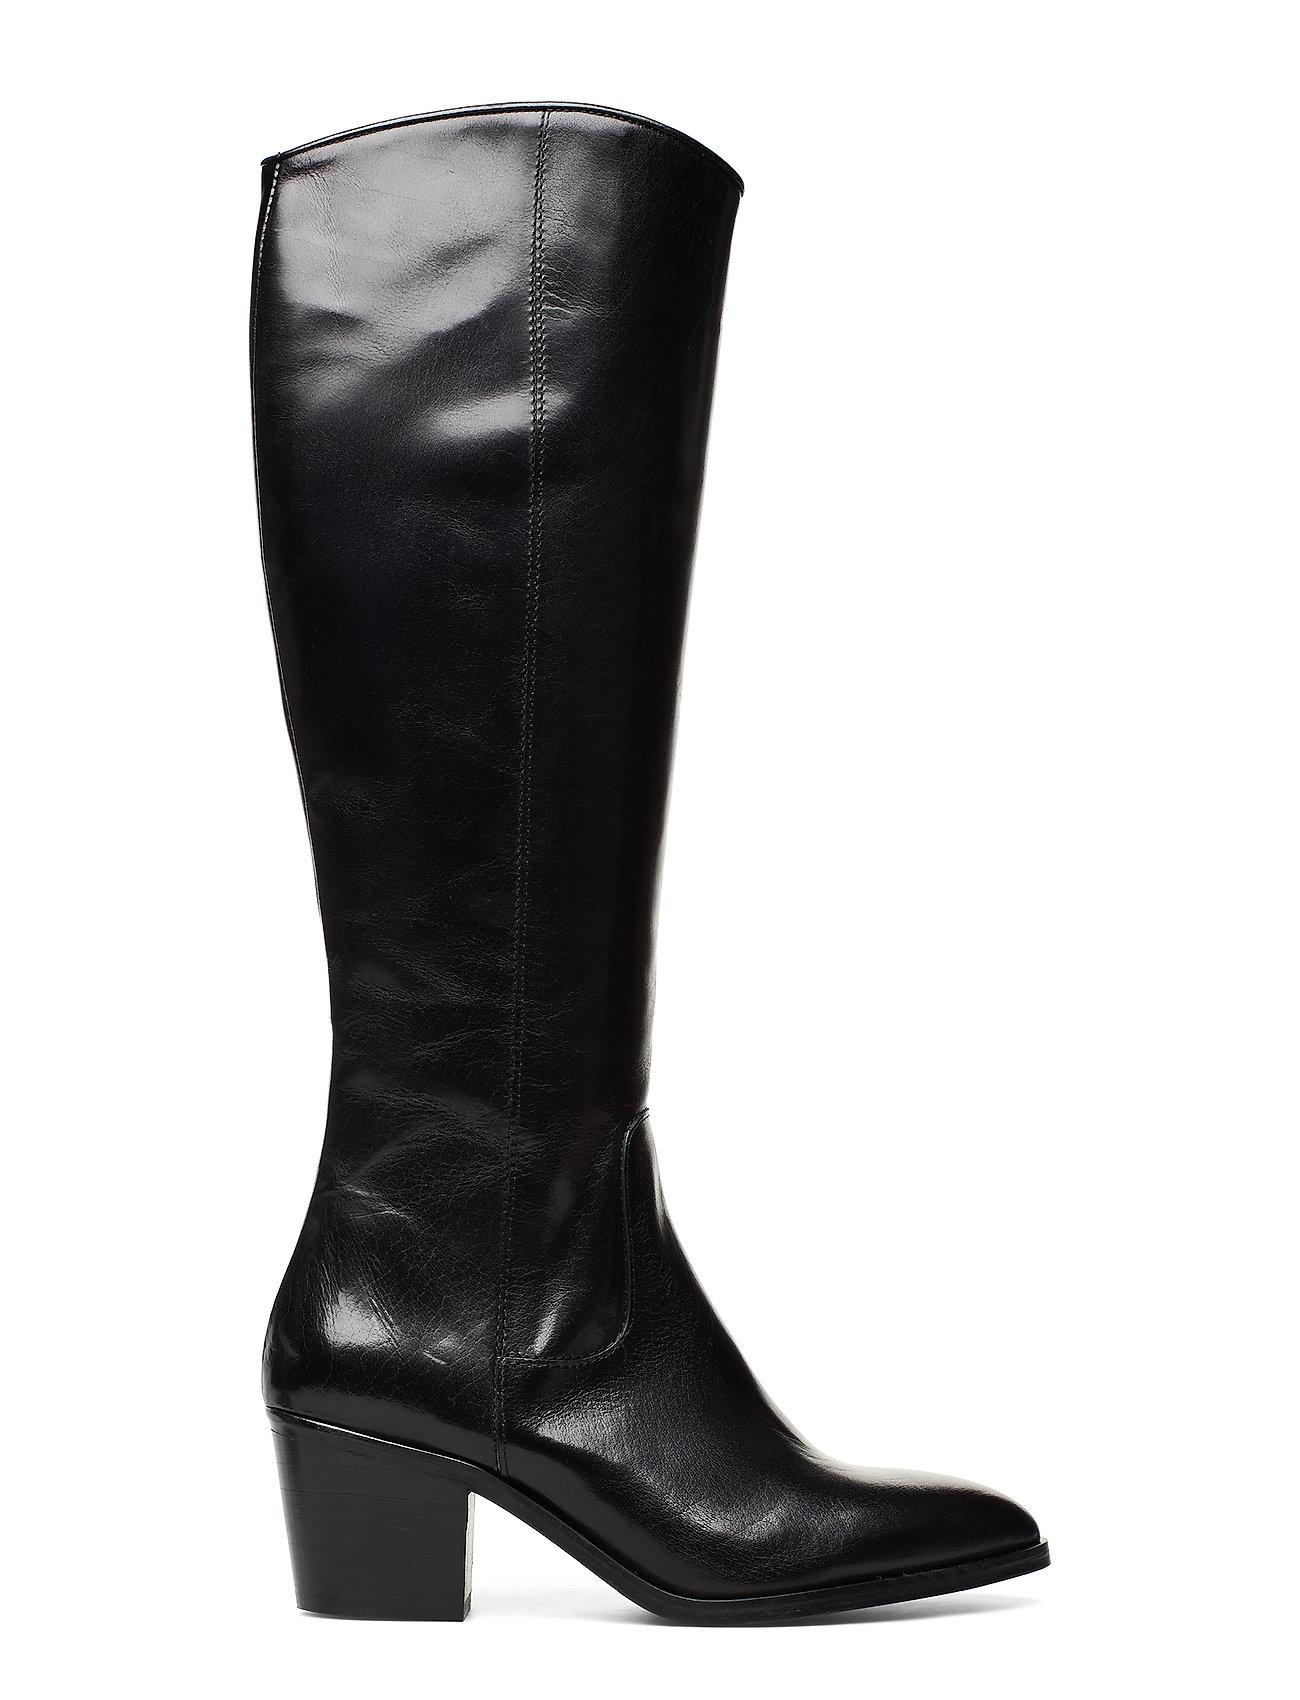 Long Boots 3444 Lange Støvler Brun Billi Bi